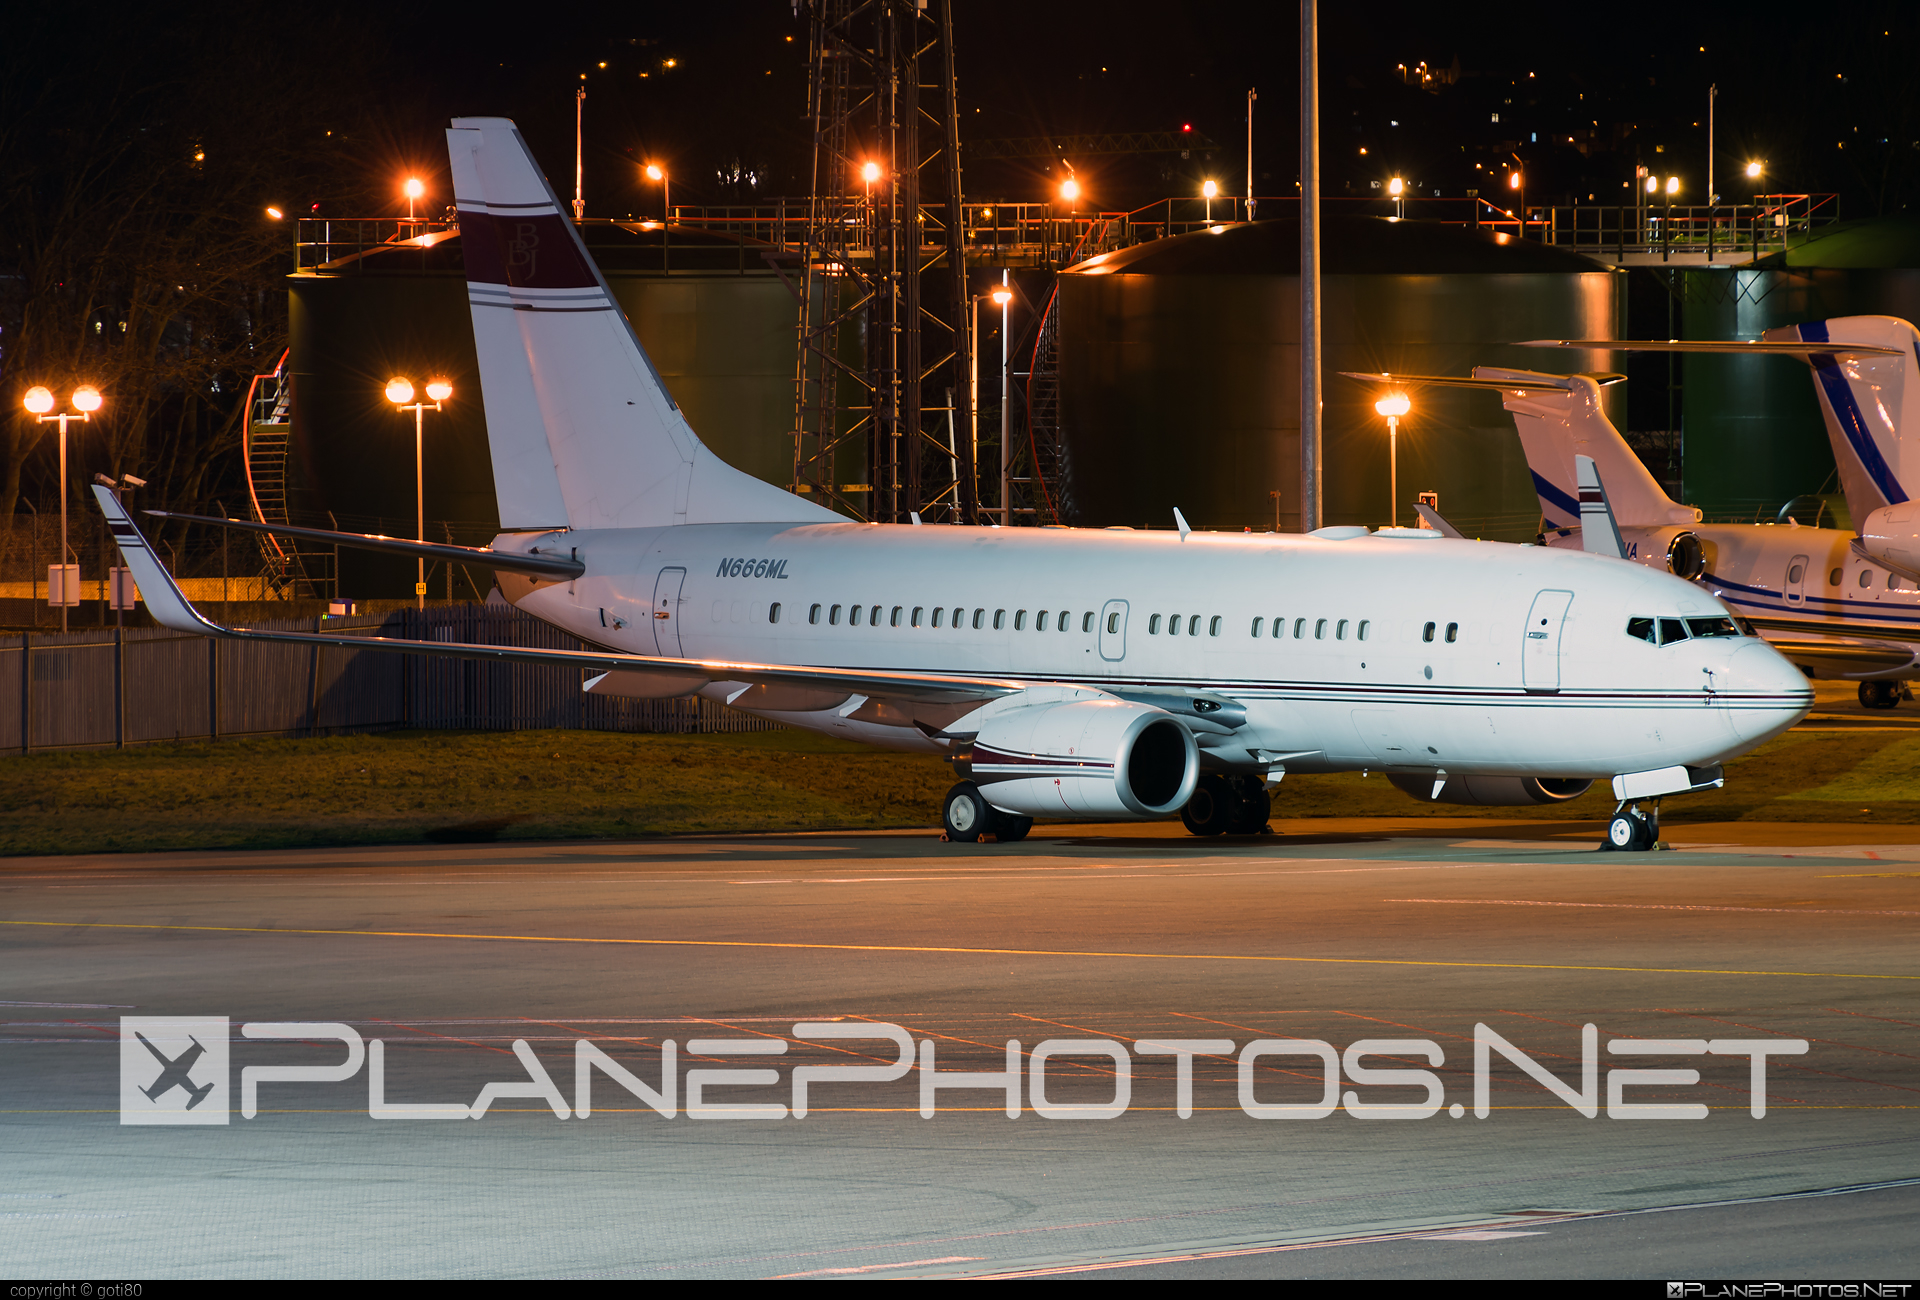 Boeing 737-700 - N666ML operated by Private operator #b737 #b737nextgen #b737ng #boeing #boeing737